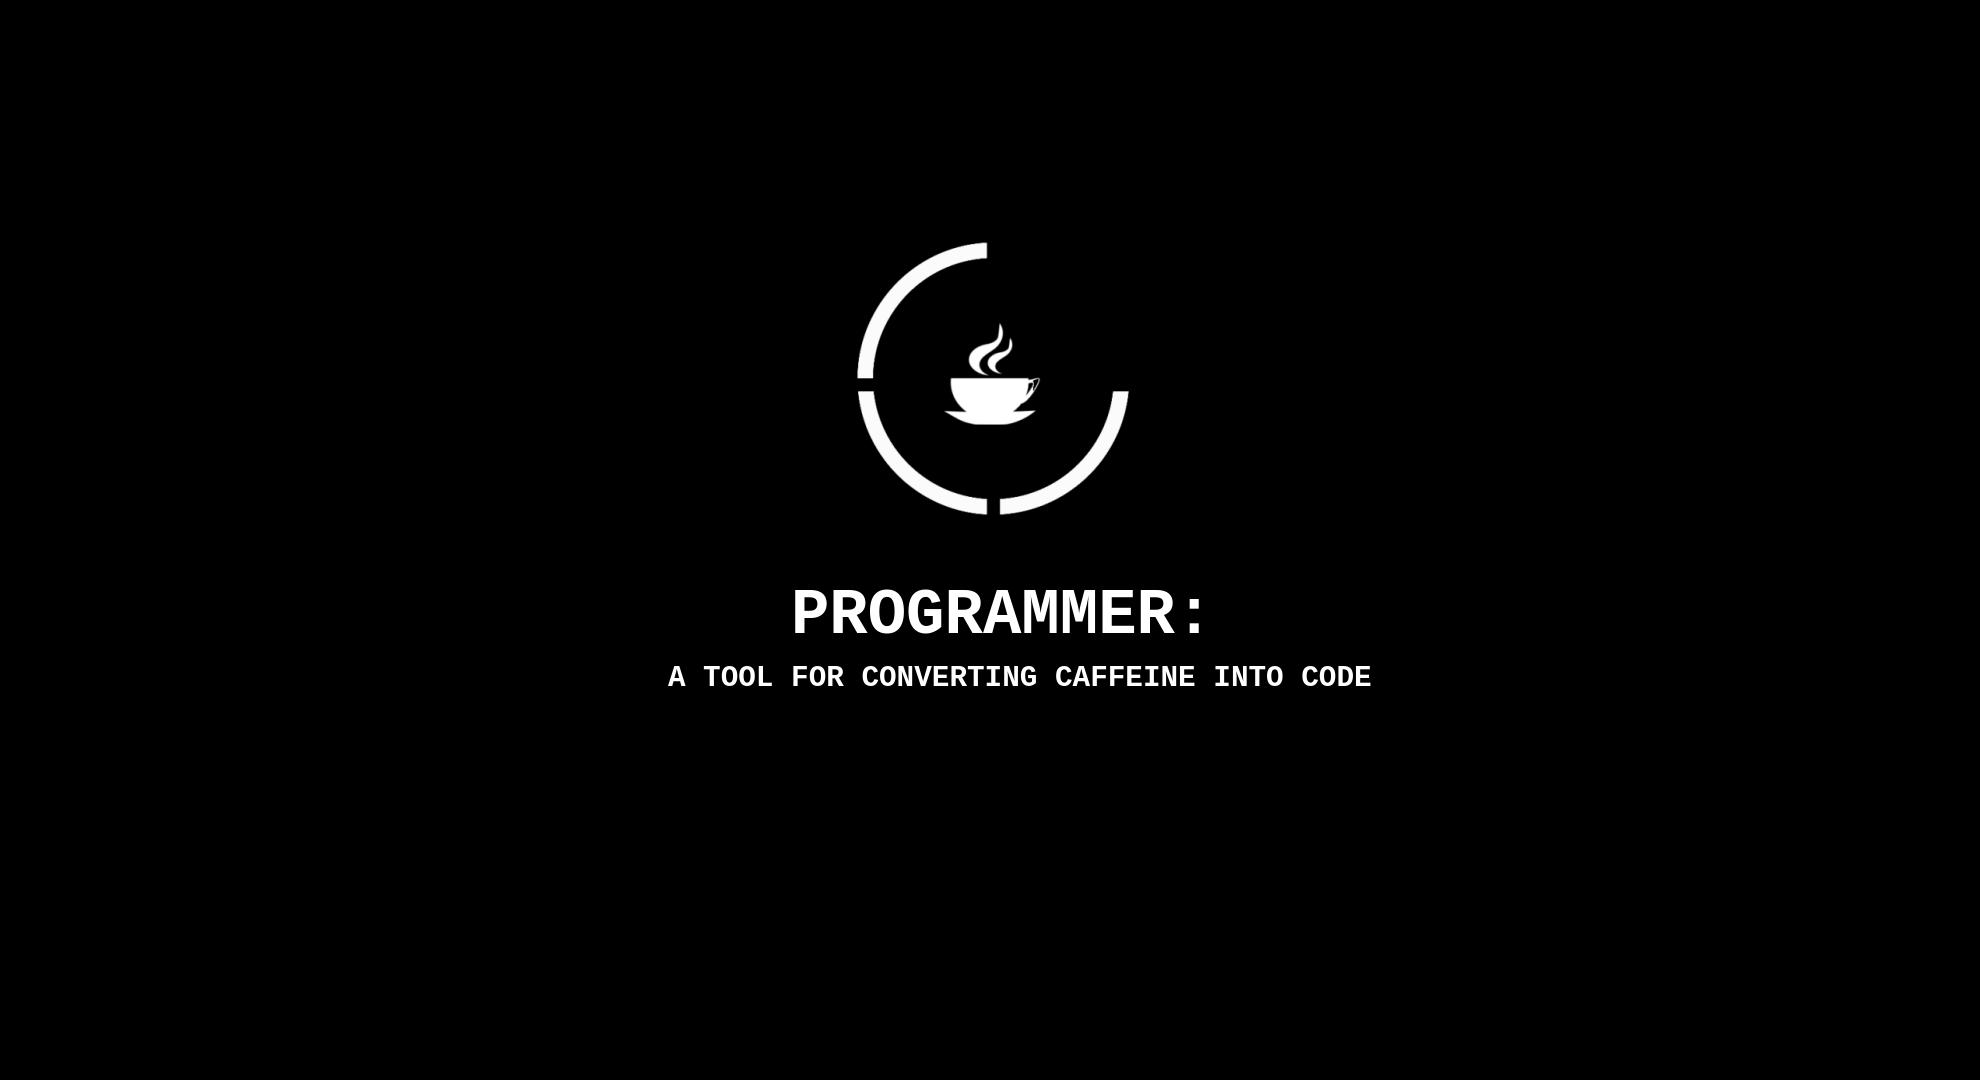 30 Programming HD Wallpapers for Desktop 1980x1080